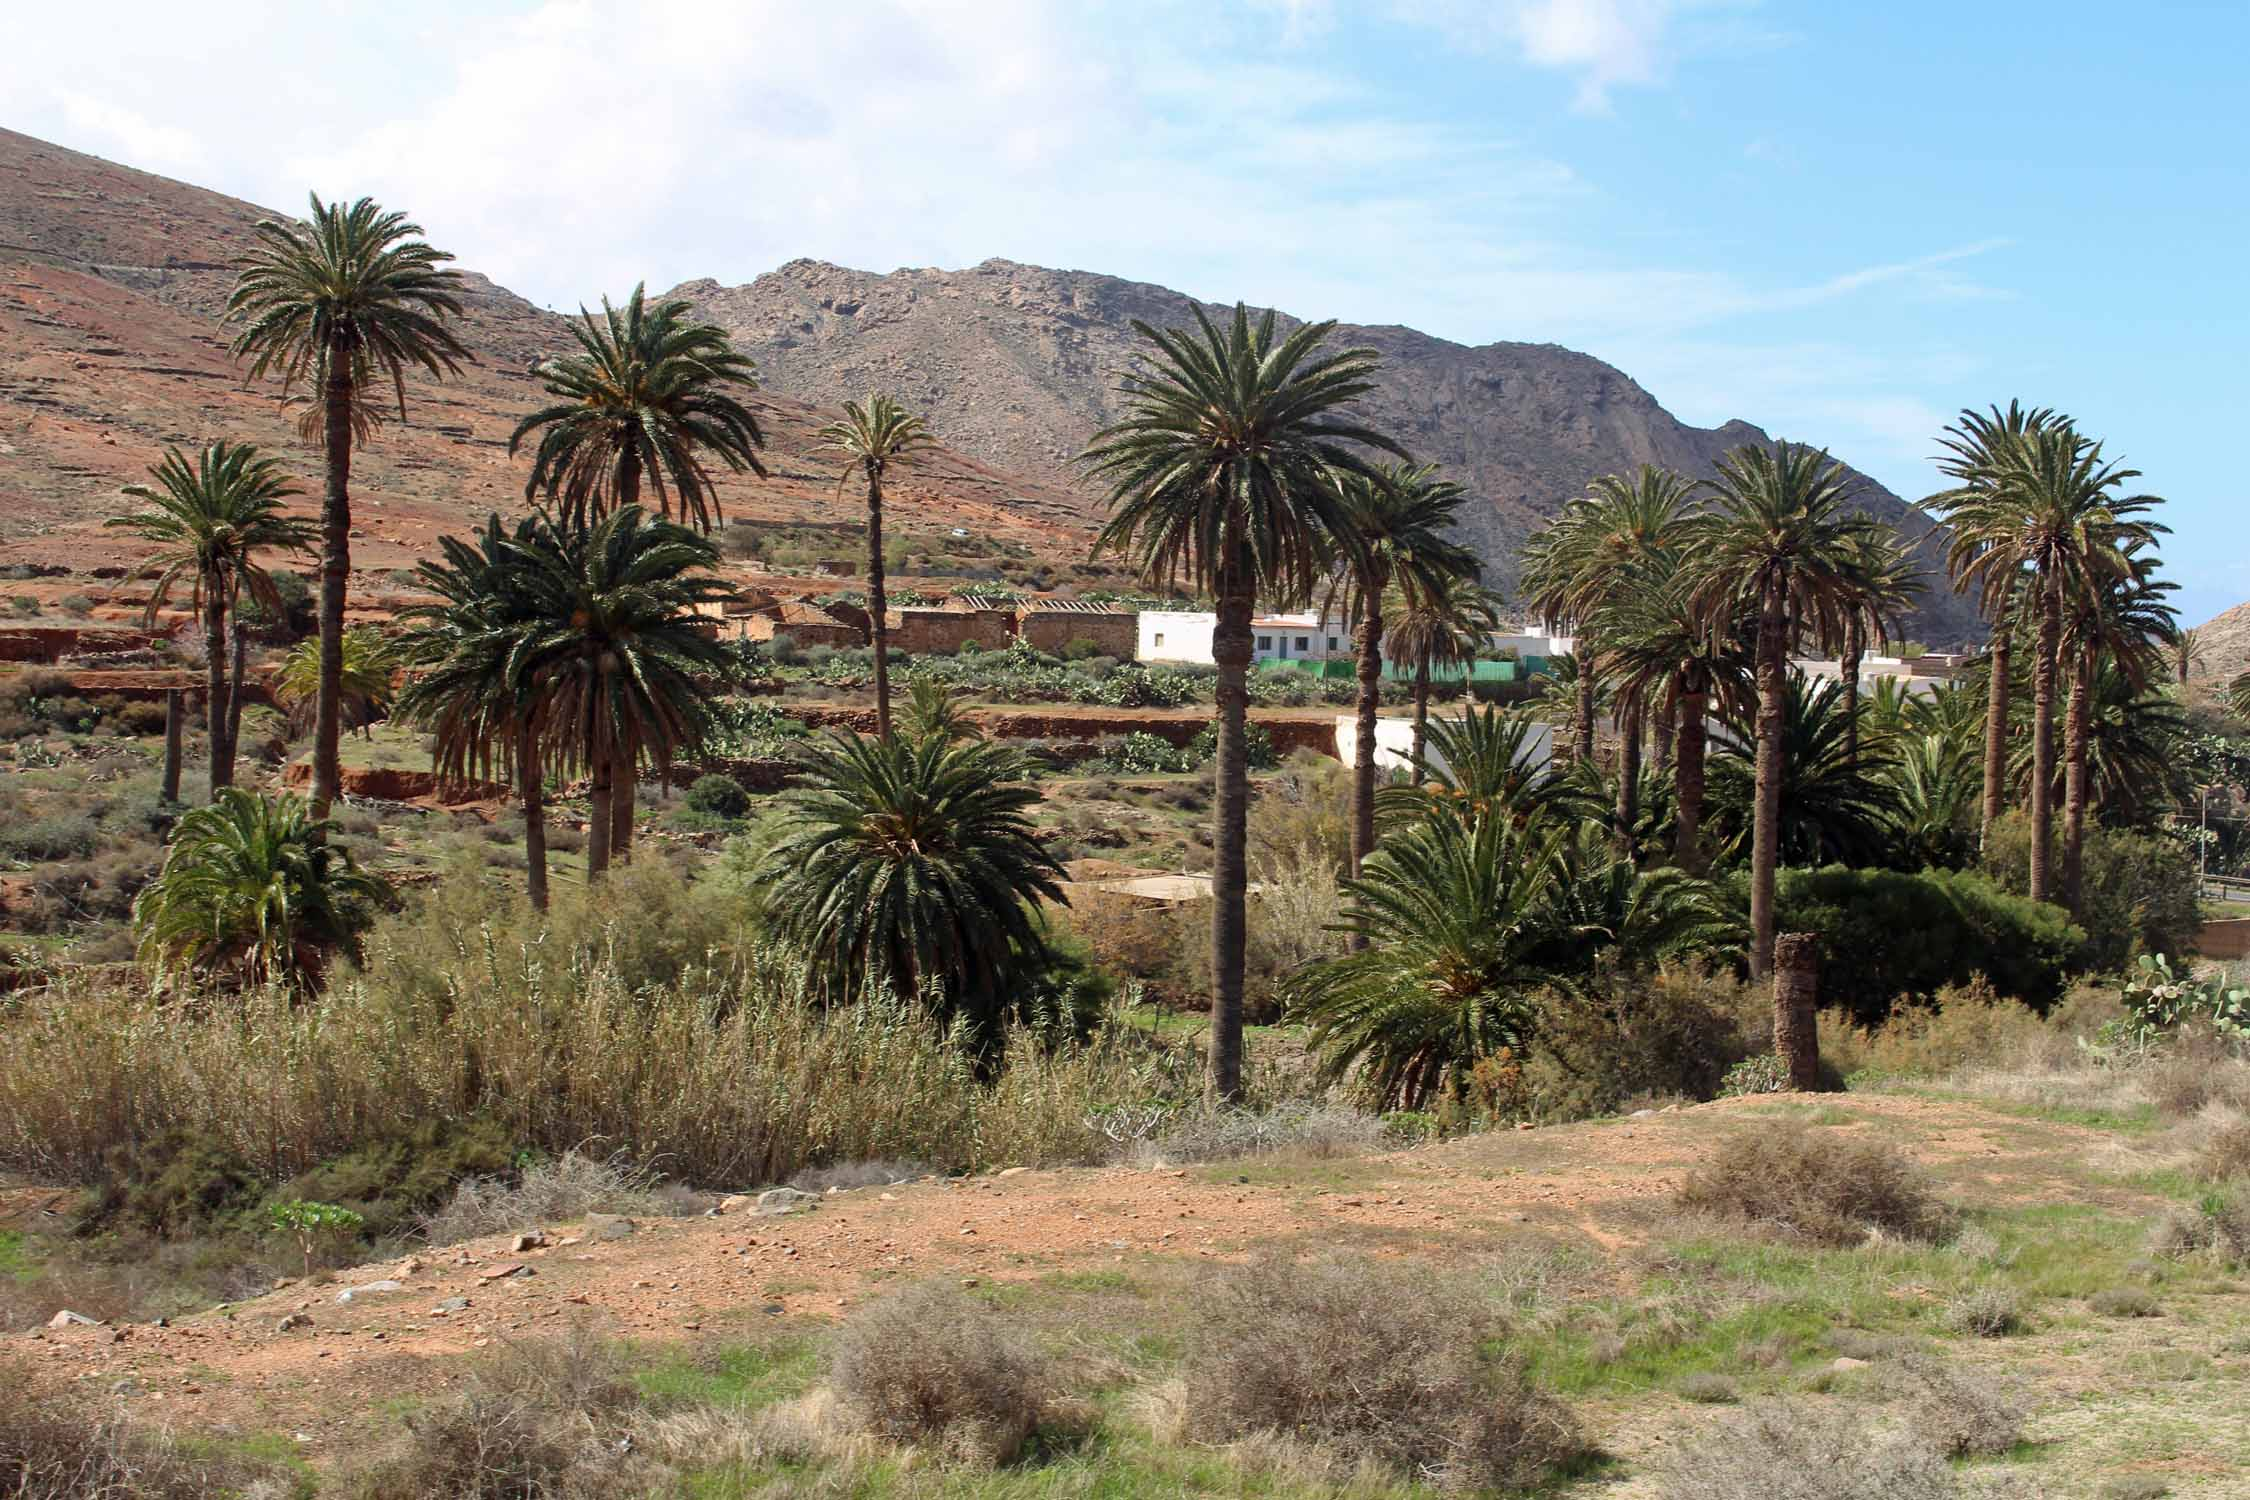 Vega de Rio Palmas